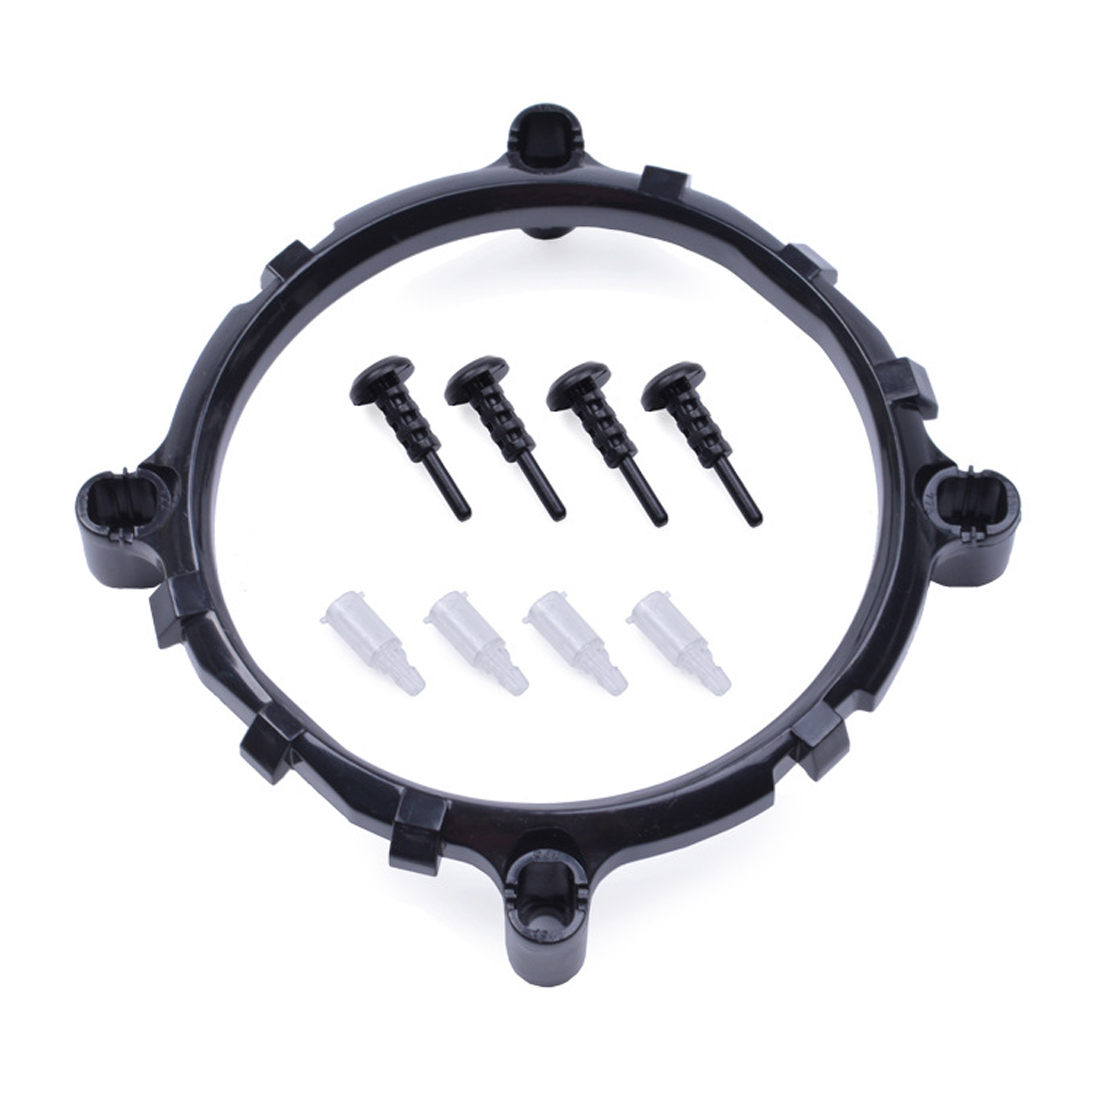 Image 5 - NOYOKERE באיכות גבוהה שולחן עבודה 3in1 מעבד למעבד מאוורר סוגר בעל גוף הקירור בסיס עבור LGA1150 1156 1155 775 1366cpu cooler fancooler fanfan bracket -